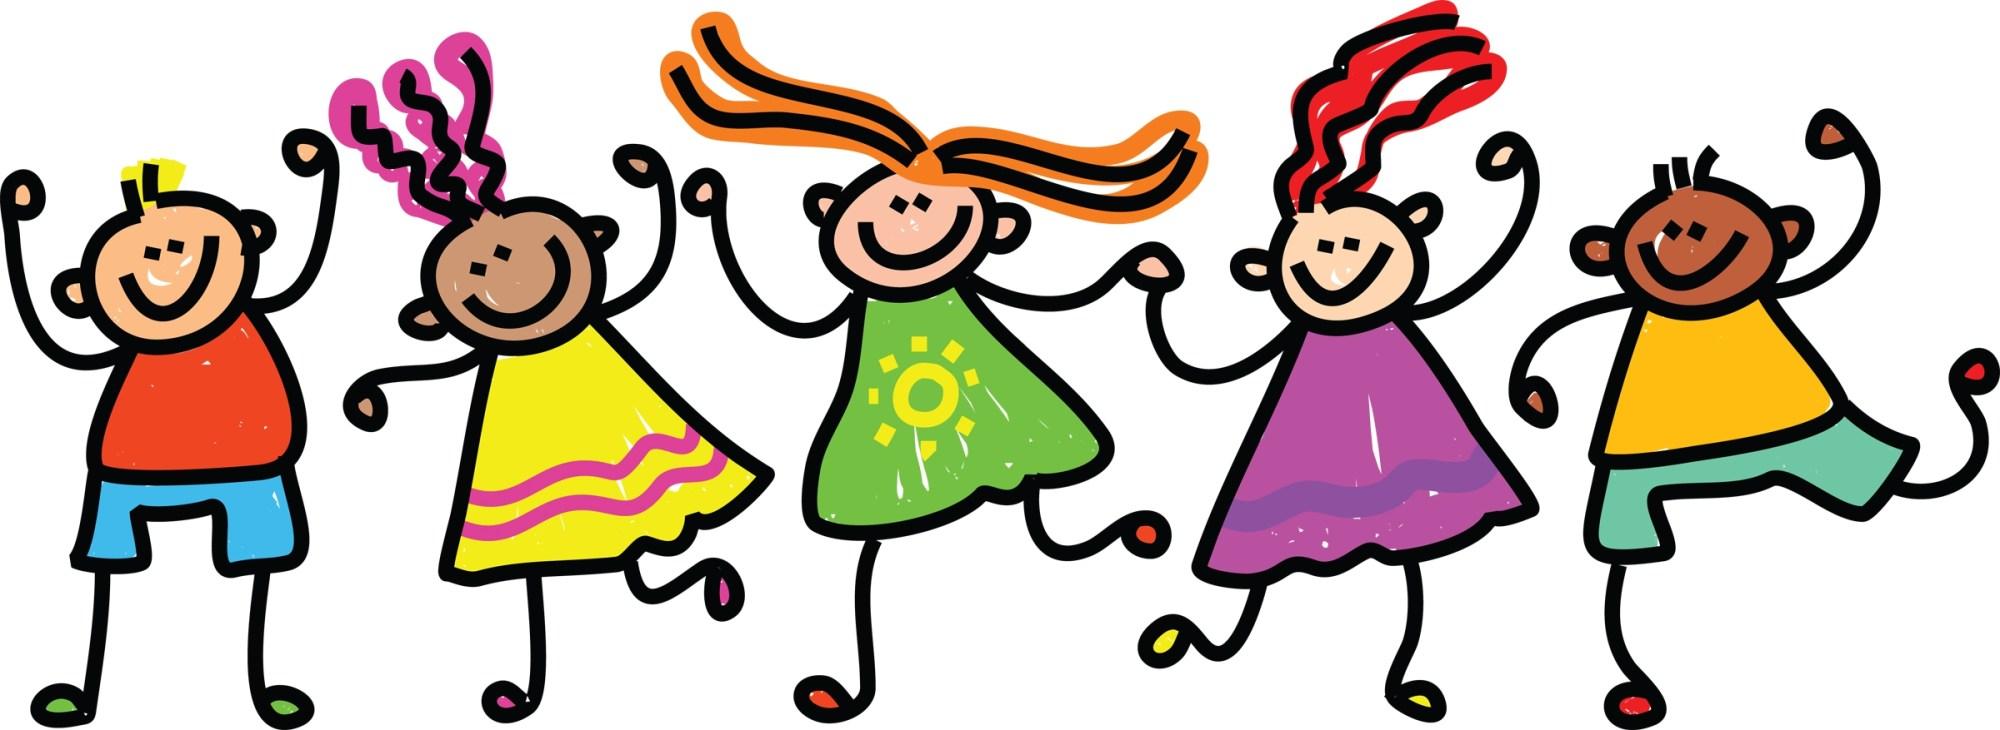 hight resolution of 2400 877 child 20clip 20art kids dancing clipart 2400 877